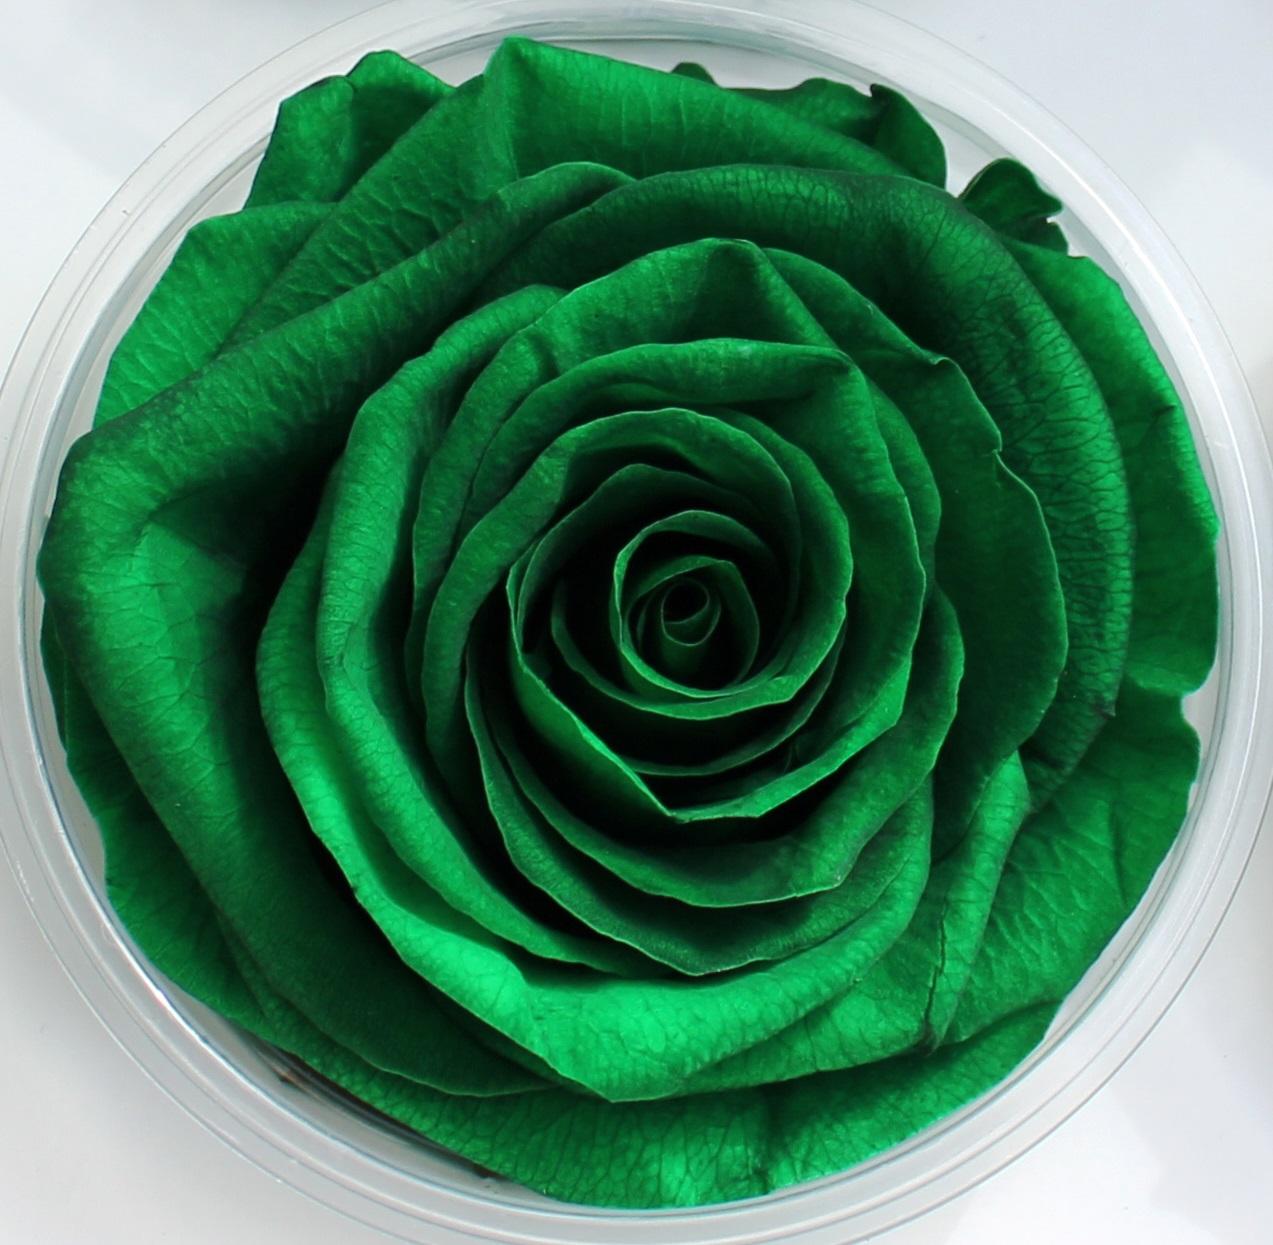 Preserved Roses  Stevens and Son Wholesale Florist